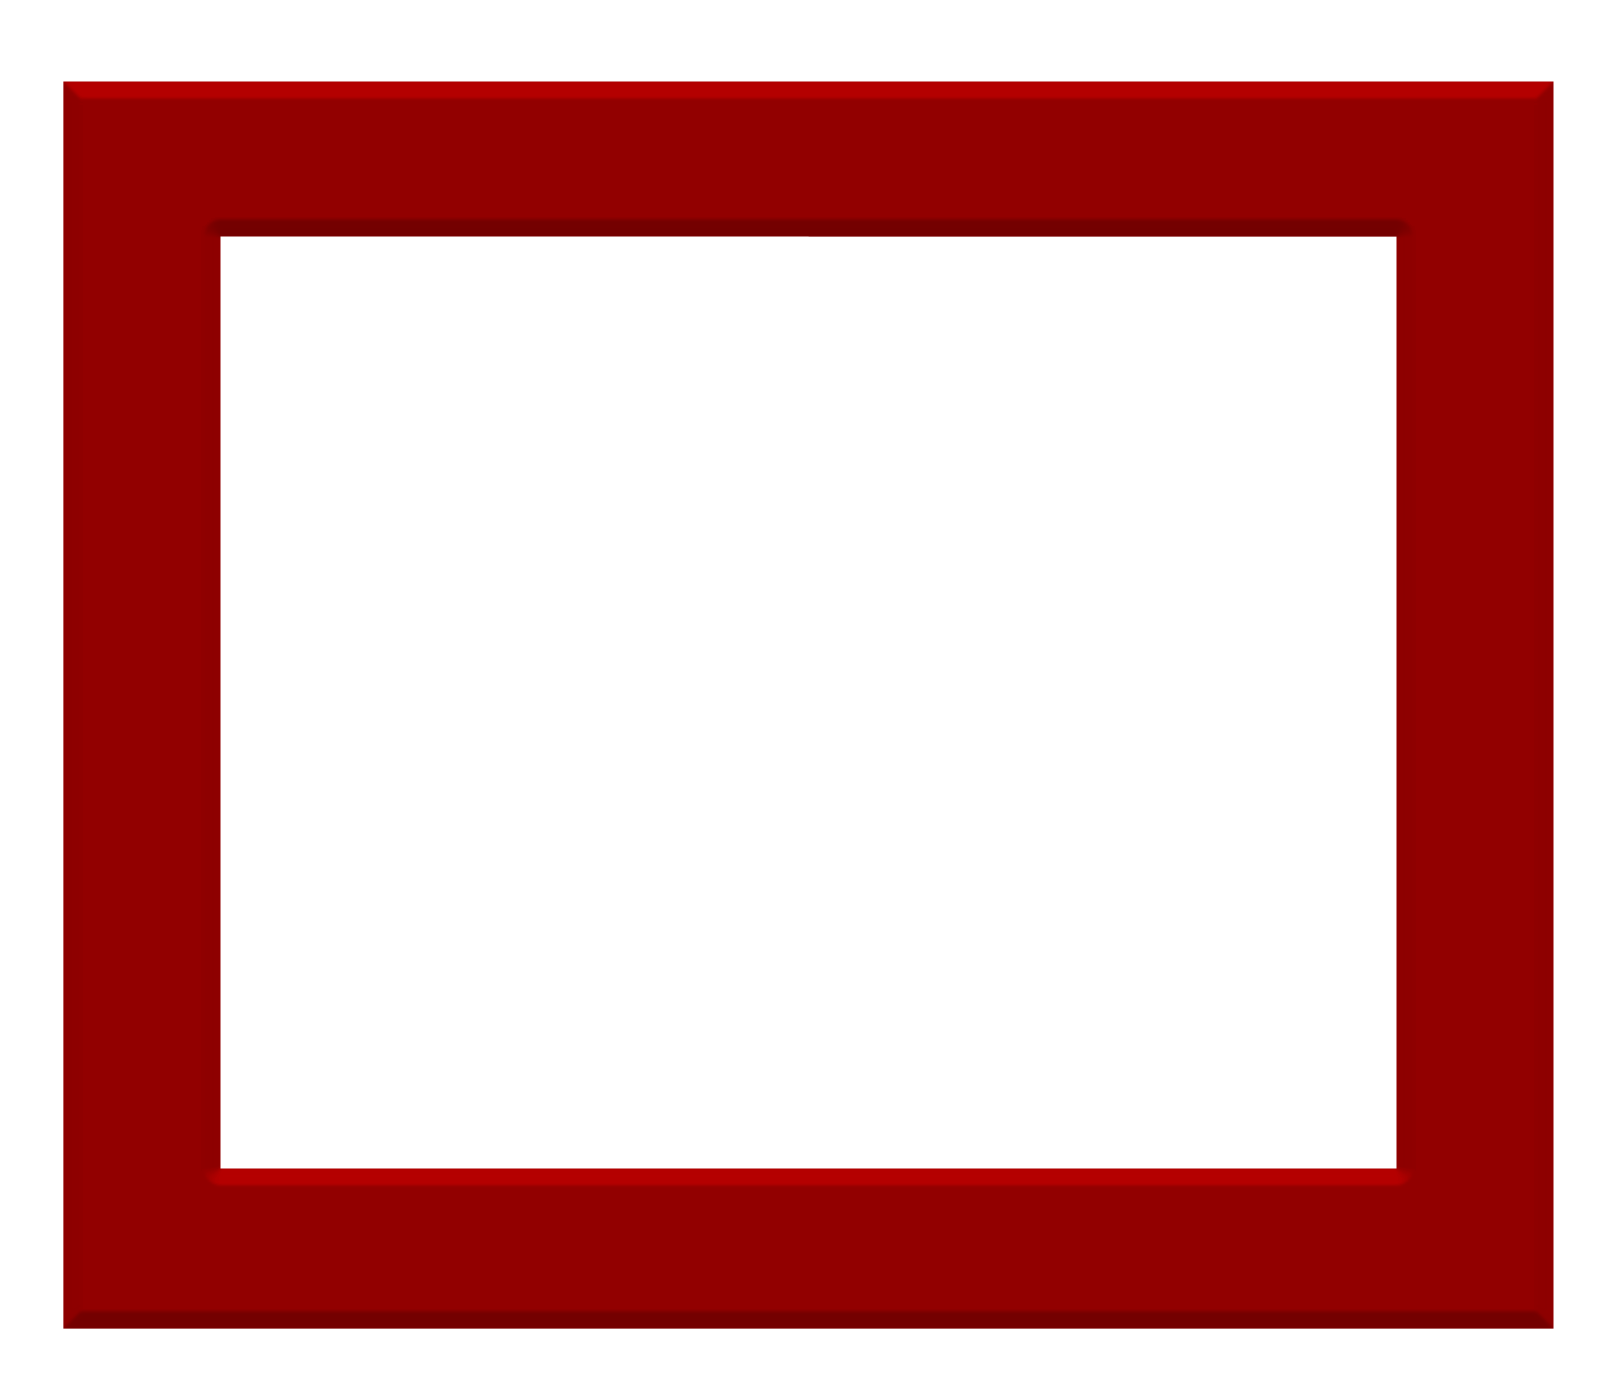 Transparent square frame frames pinterest squares scrapbook 13 cool images of square frame photoshop heart frames for photoshop square frame photoshop brushes free photoshop frames and borders templates free digital jeuxipadfo Images